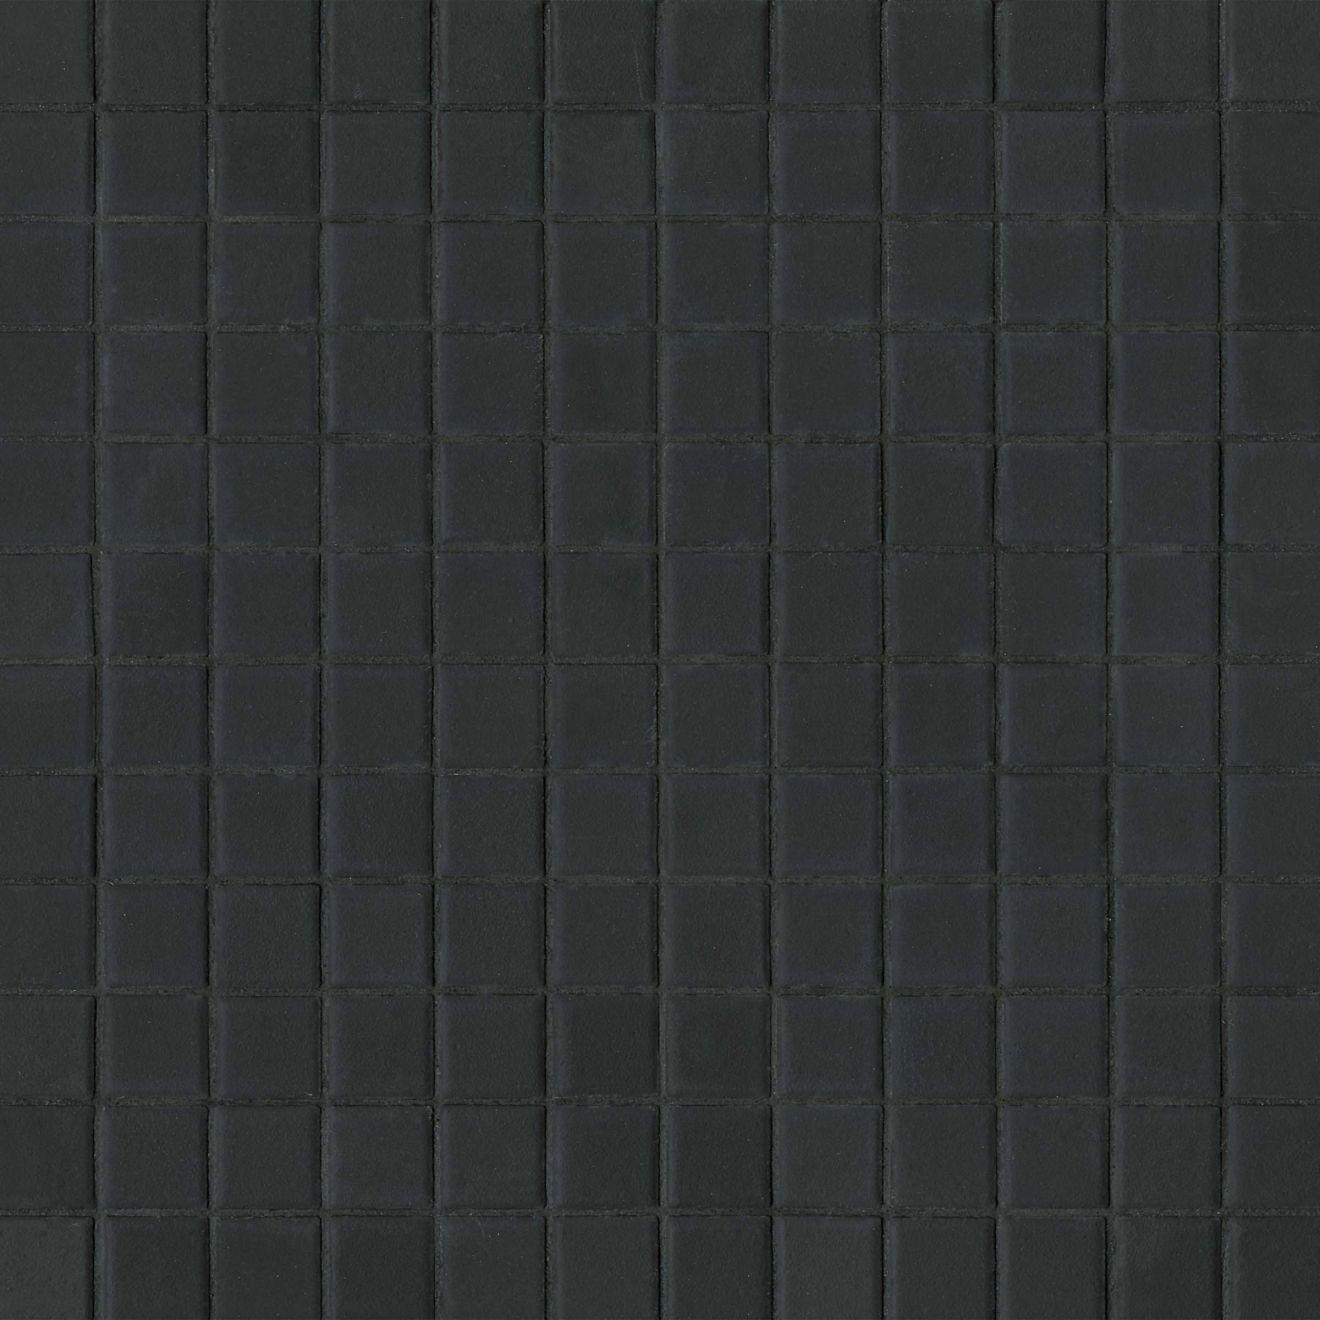 "True 1"" x 1"" Floor & Wall Mosaic in Black"